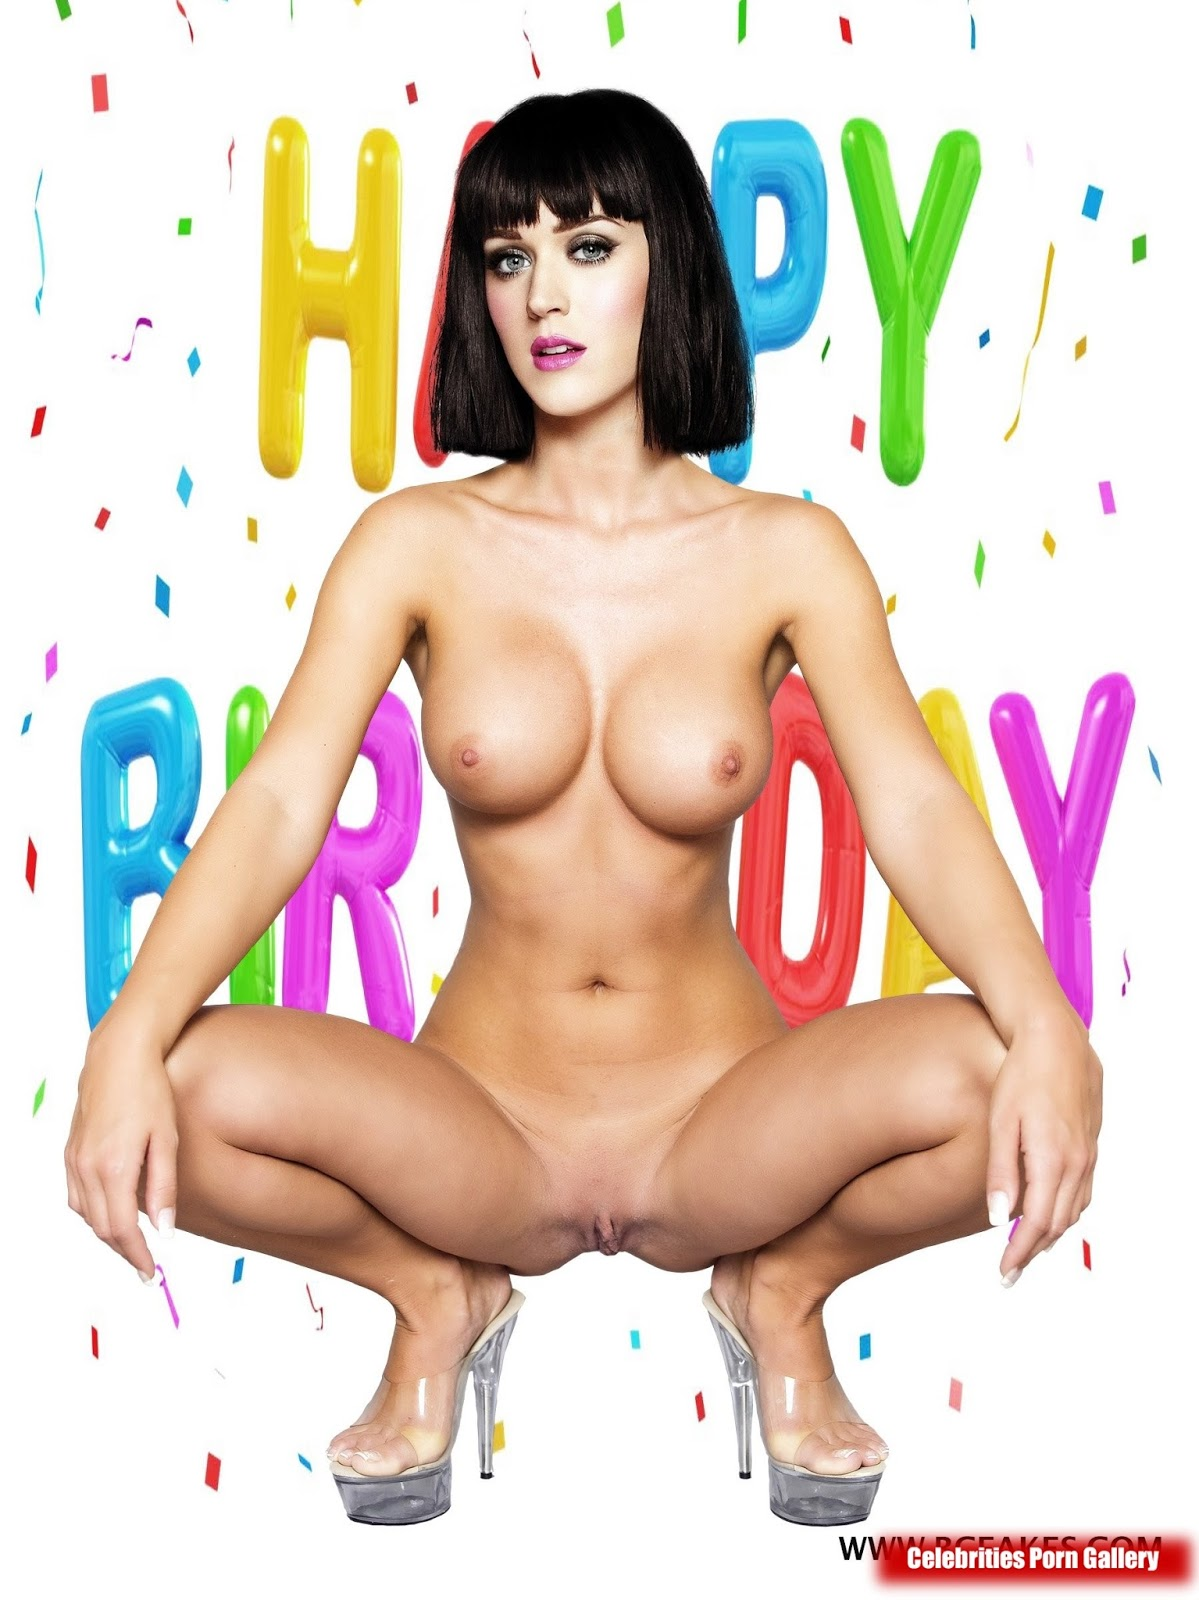 The best of katy perry's bikini photos eu headlines